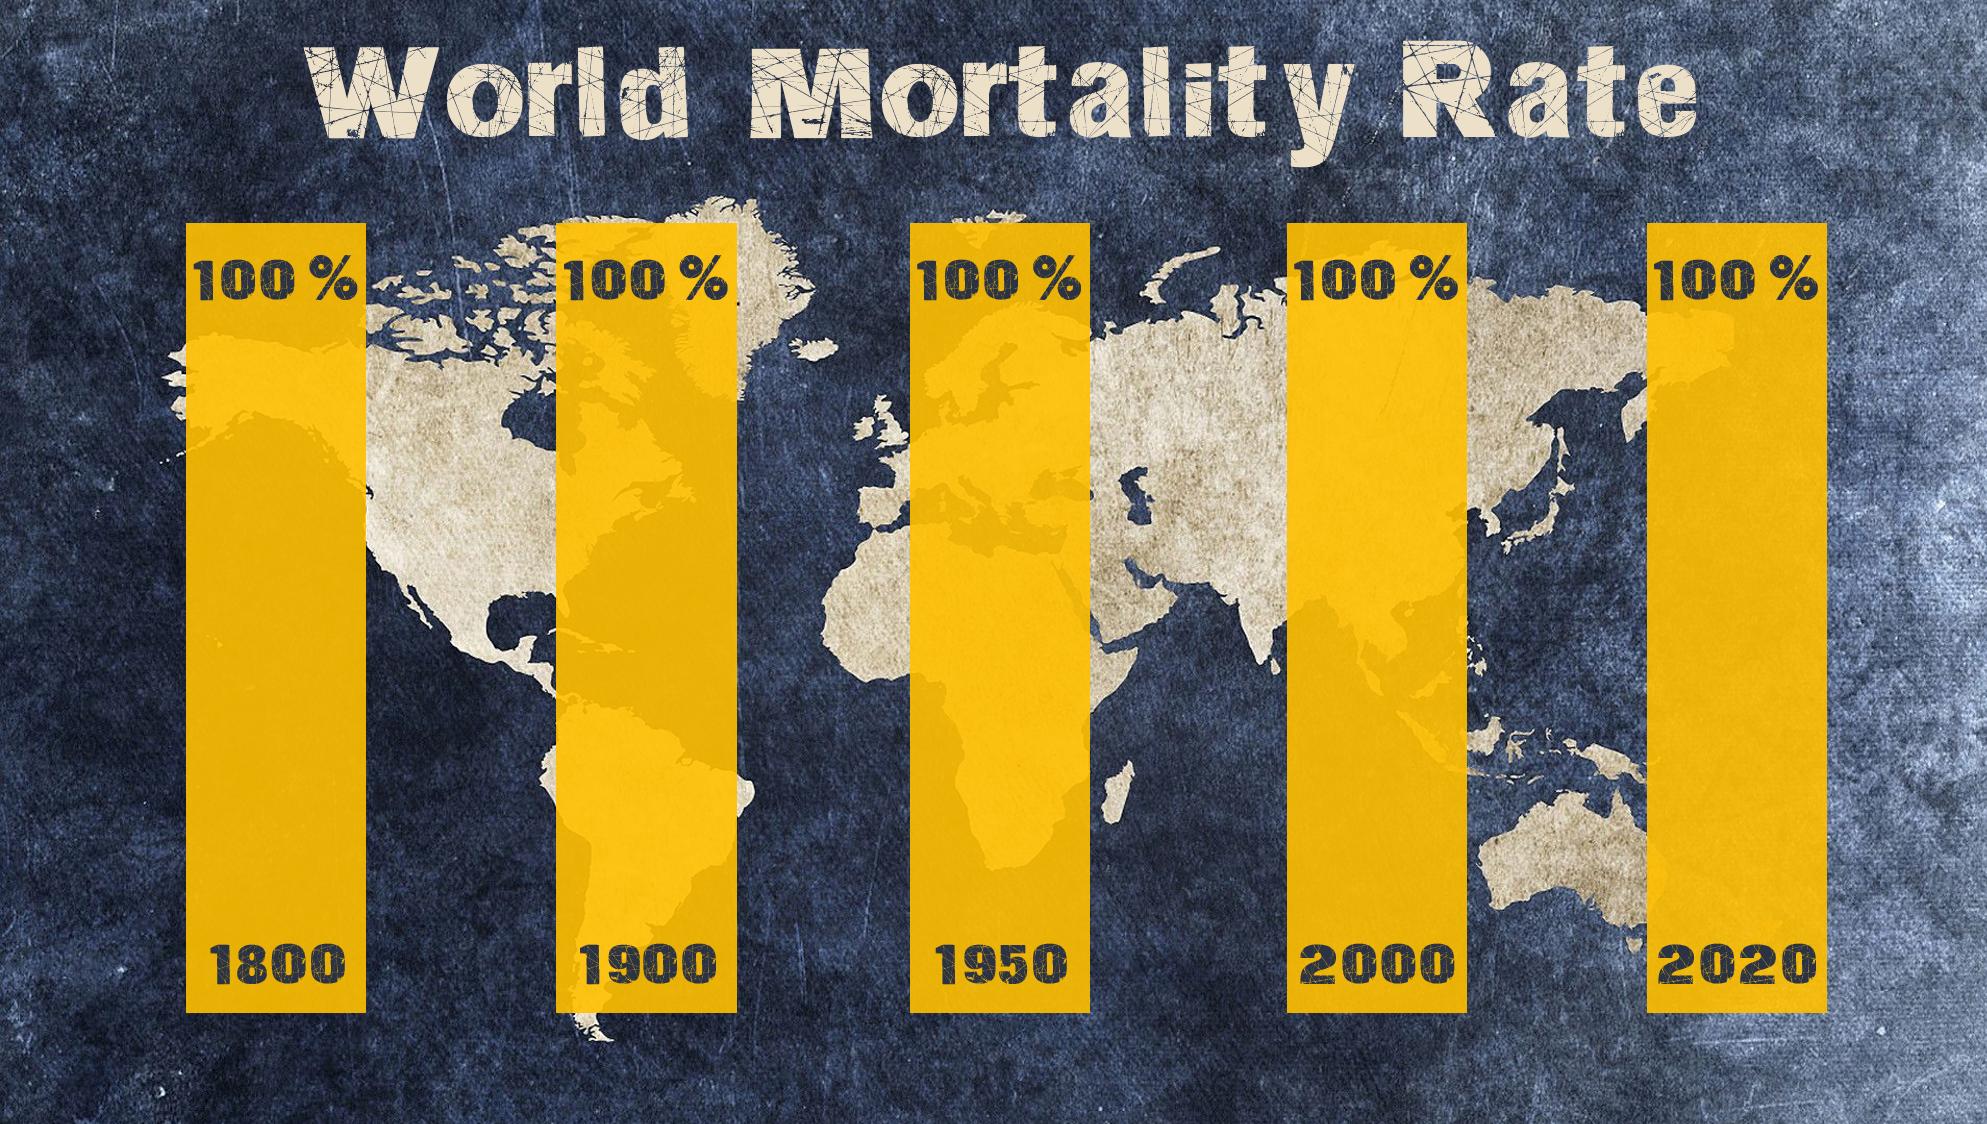 World Mortality Rate 2020